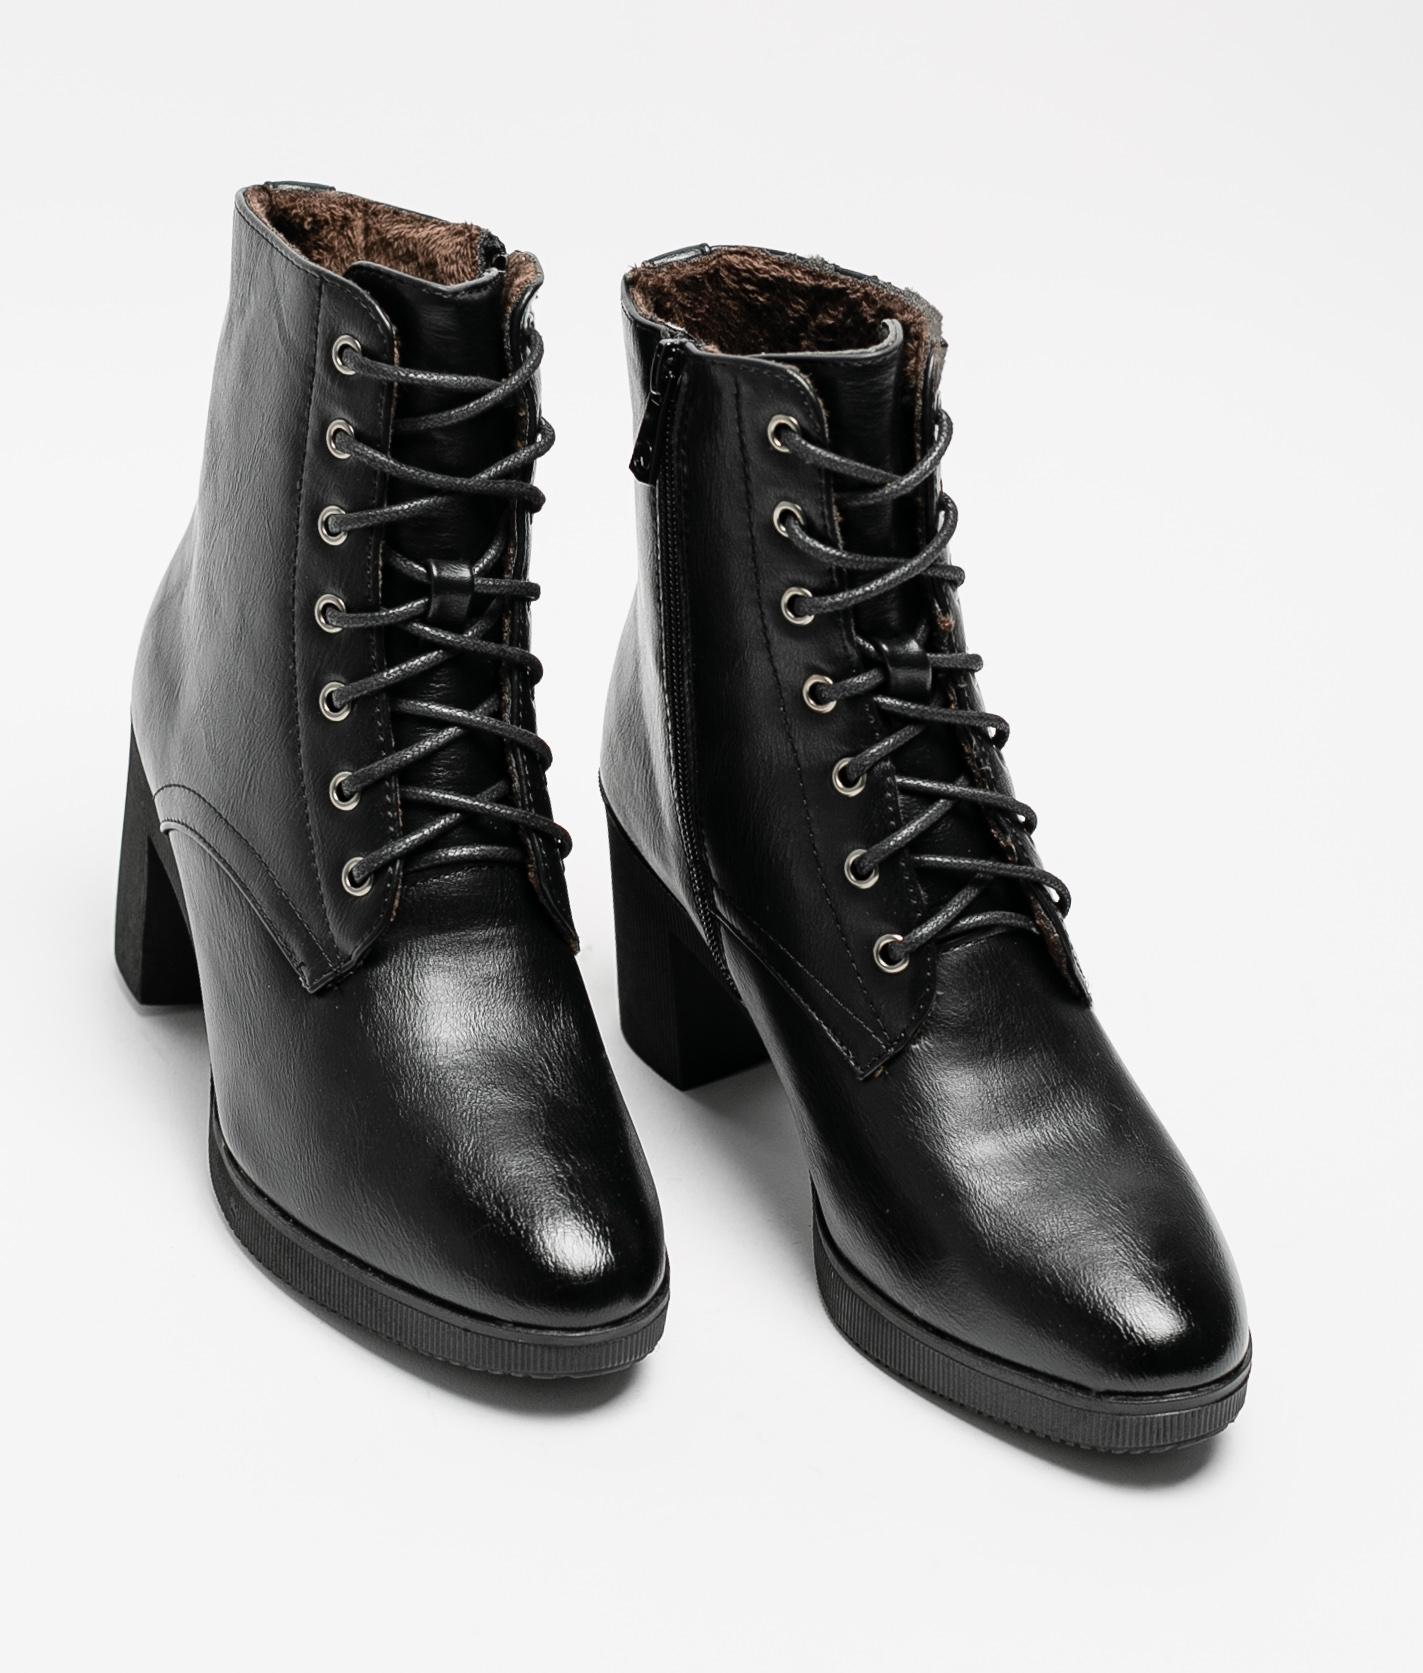 Boot Petite Garet - Noir